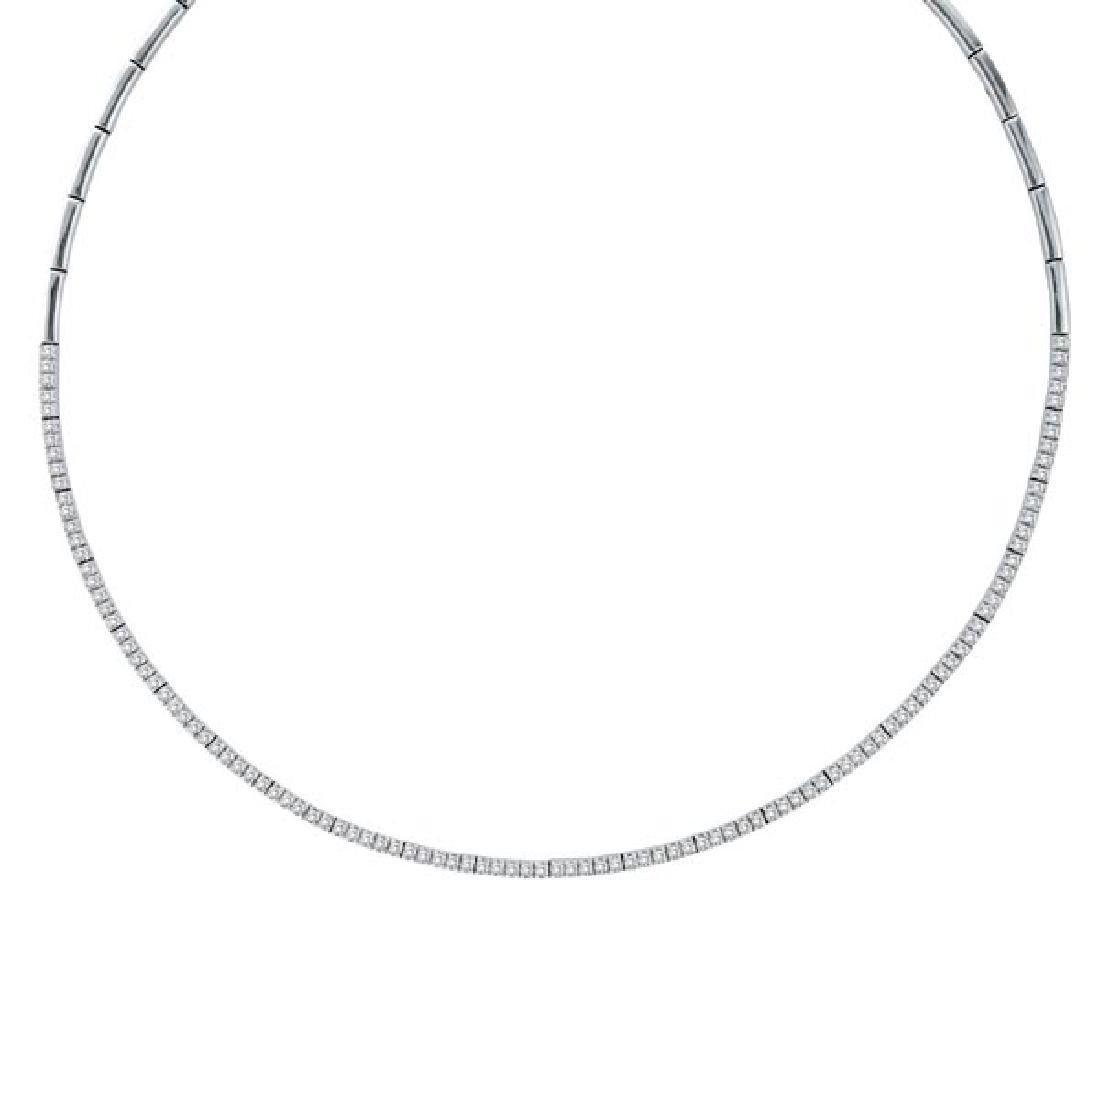 Diamond Tennis Choker Necklace in 14k White Gold (2.31c